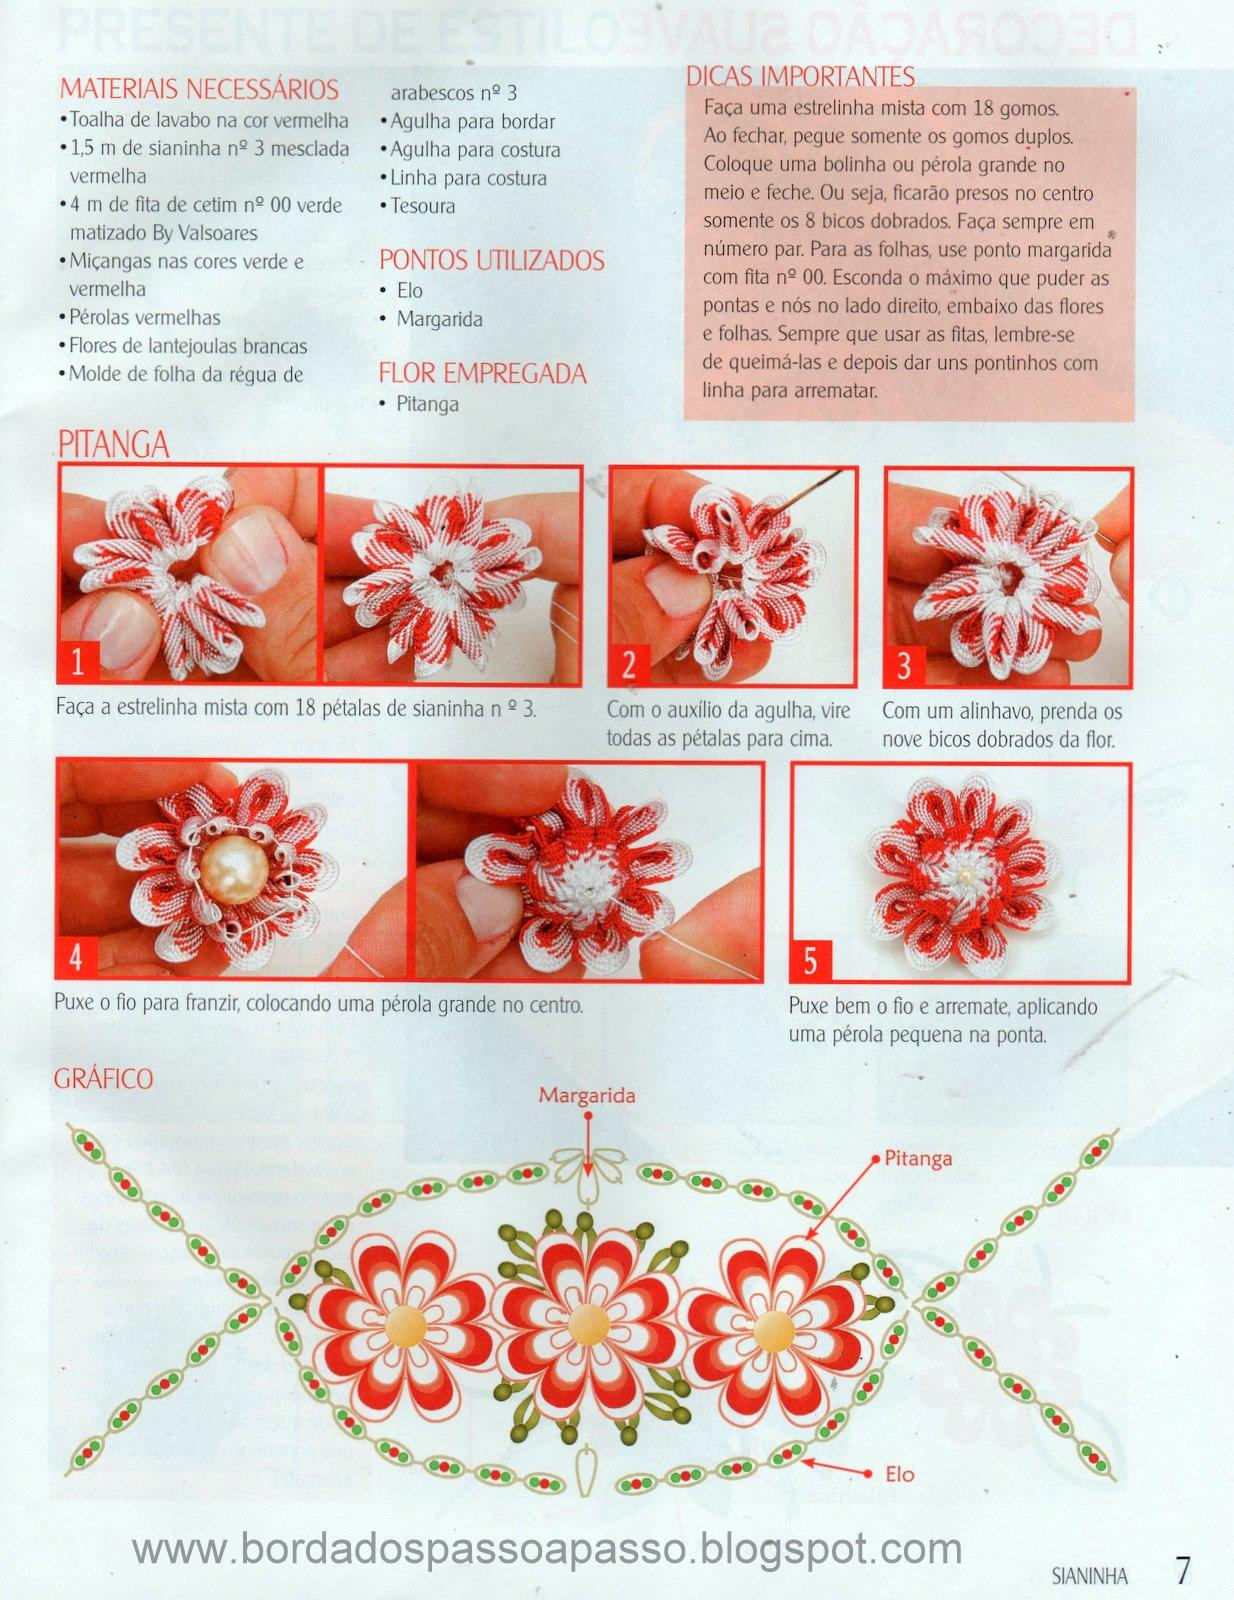 http://2.bp.blogspot.com/_zqAd5bB6G9Y/THMi7xkdYeI/AAAAAAAACNE/xoSvYtqq5Us/s1600/toalha+vermelha+bordada+com+sinhaninha+002.jpg